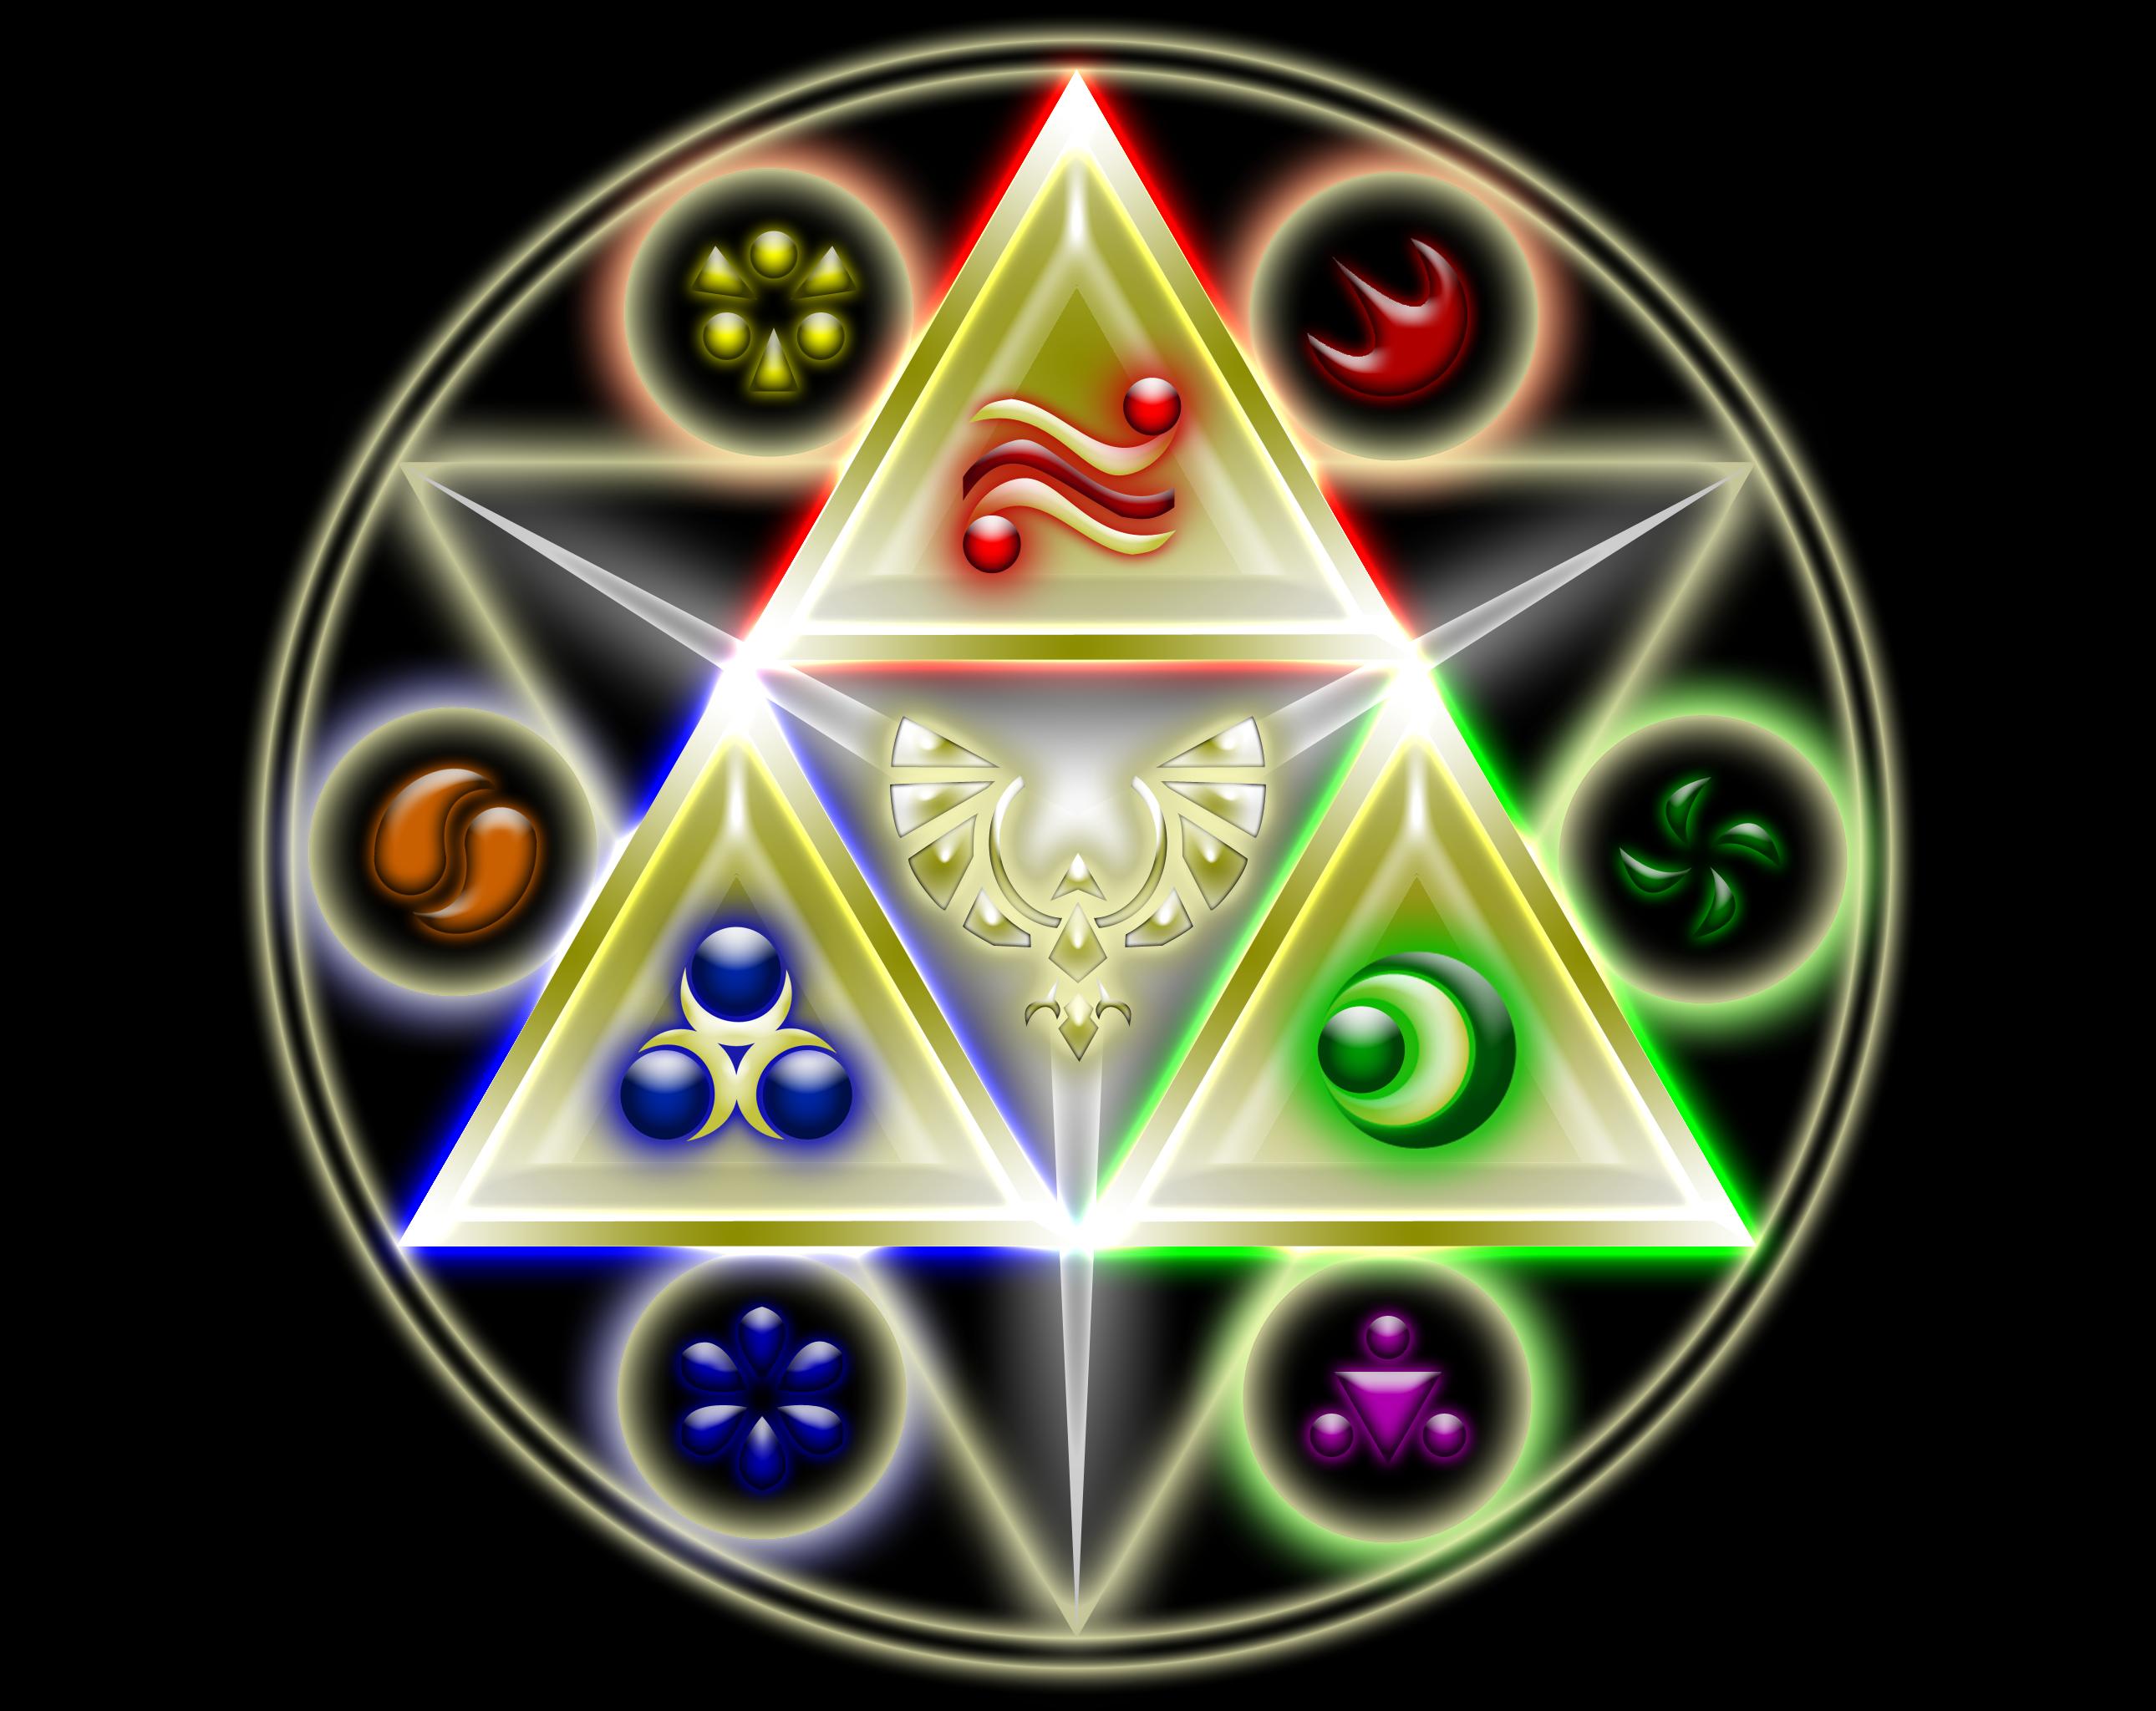 Legend Of Zelda Tattoo Ideas Triforce Wallpaper Hd Zelda Tattoo Legend Of Zelda Tattoos Legend Of Zelda